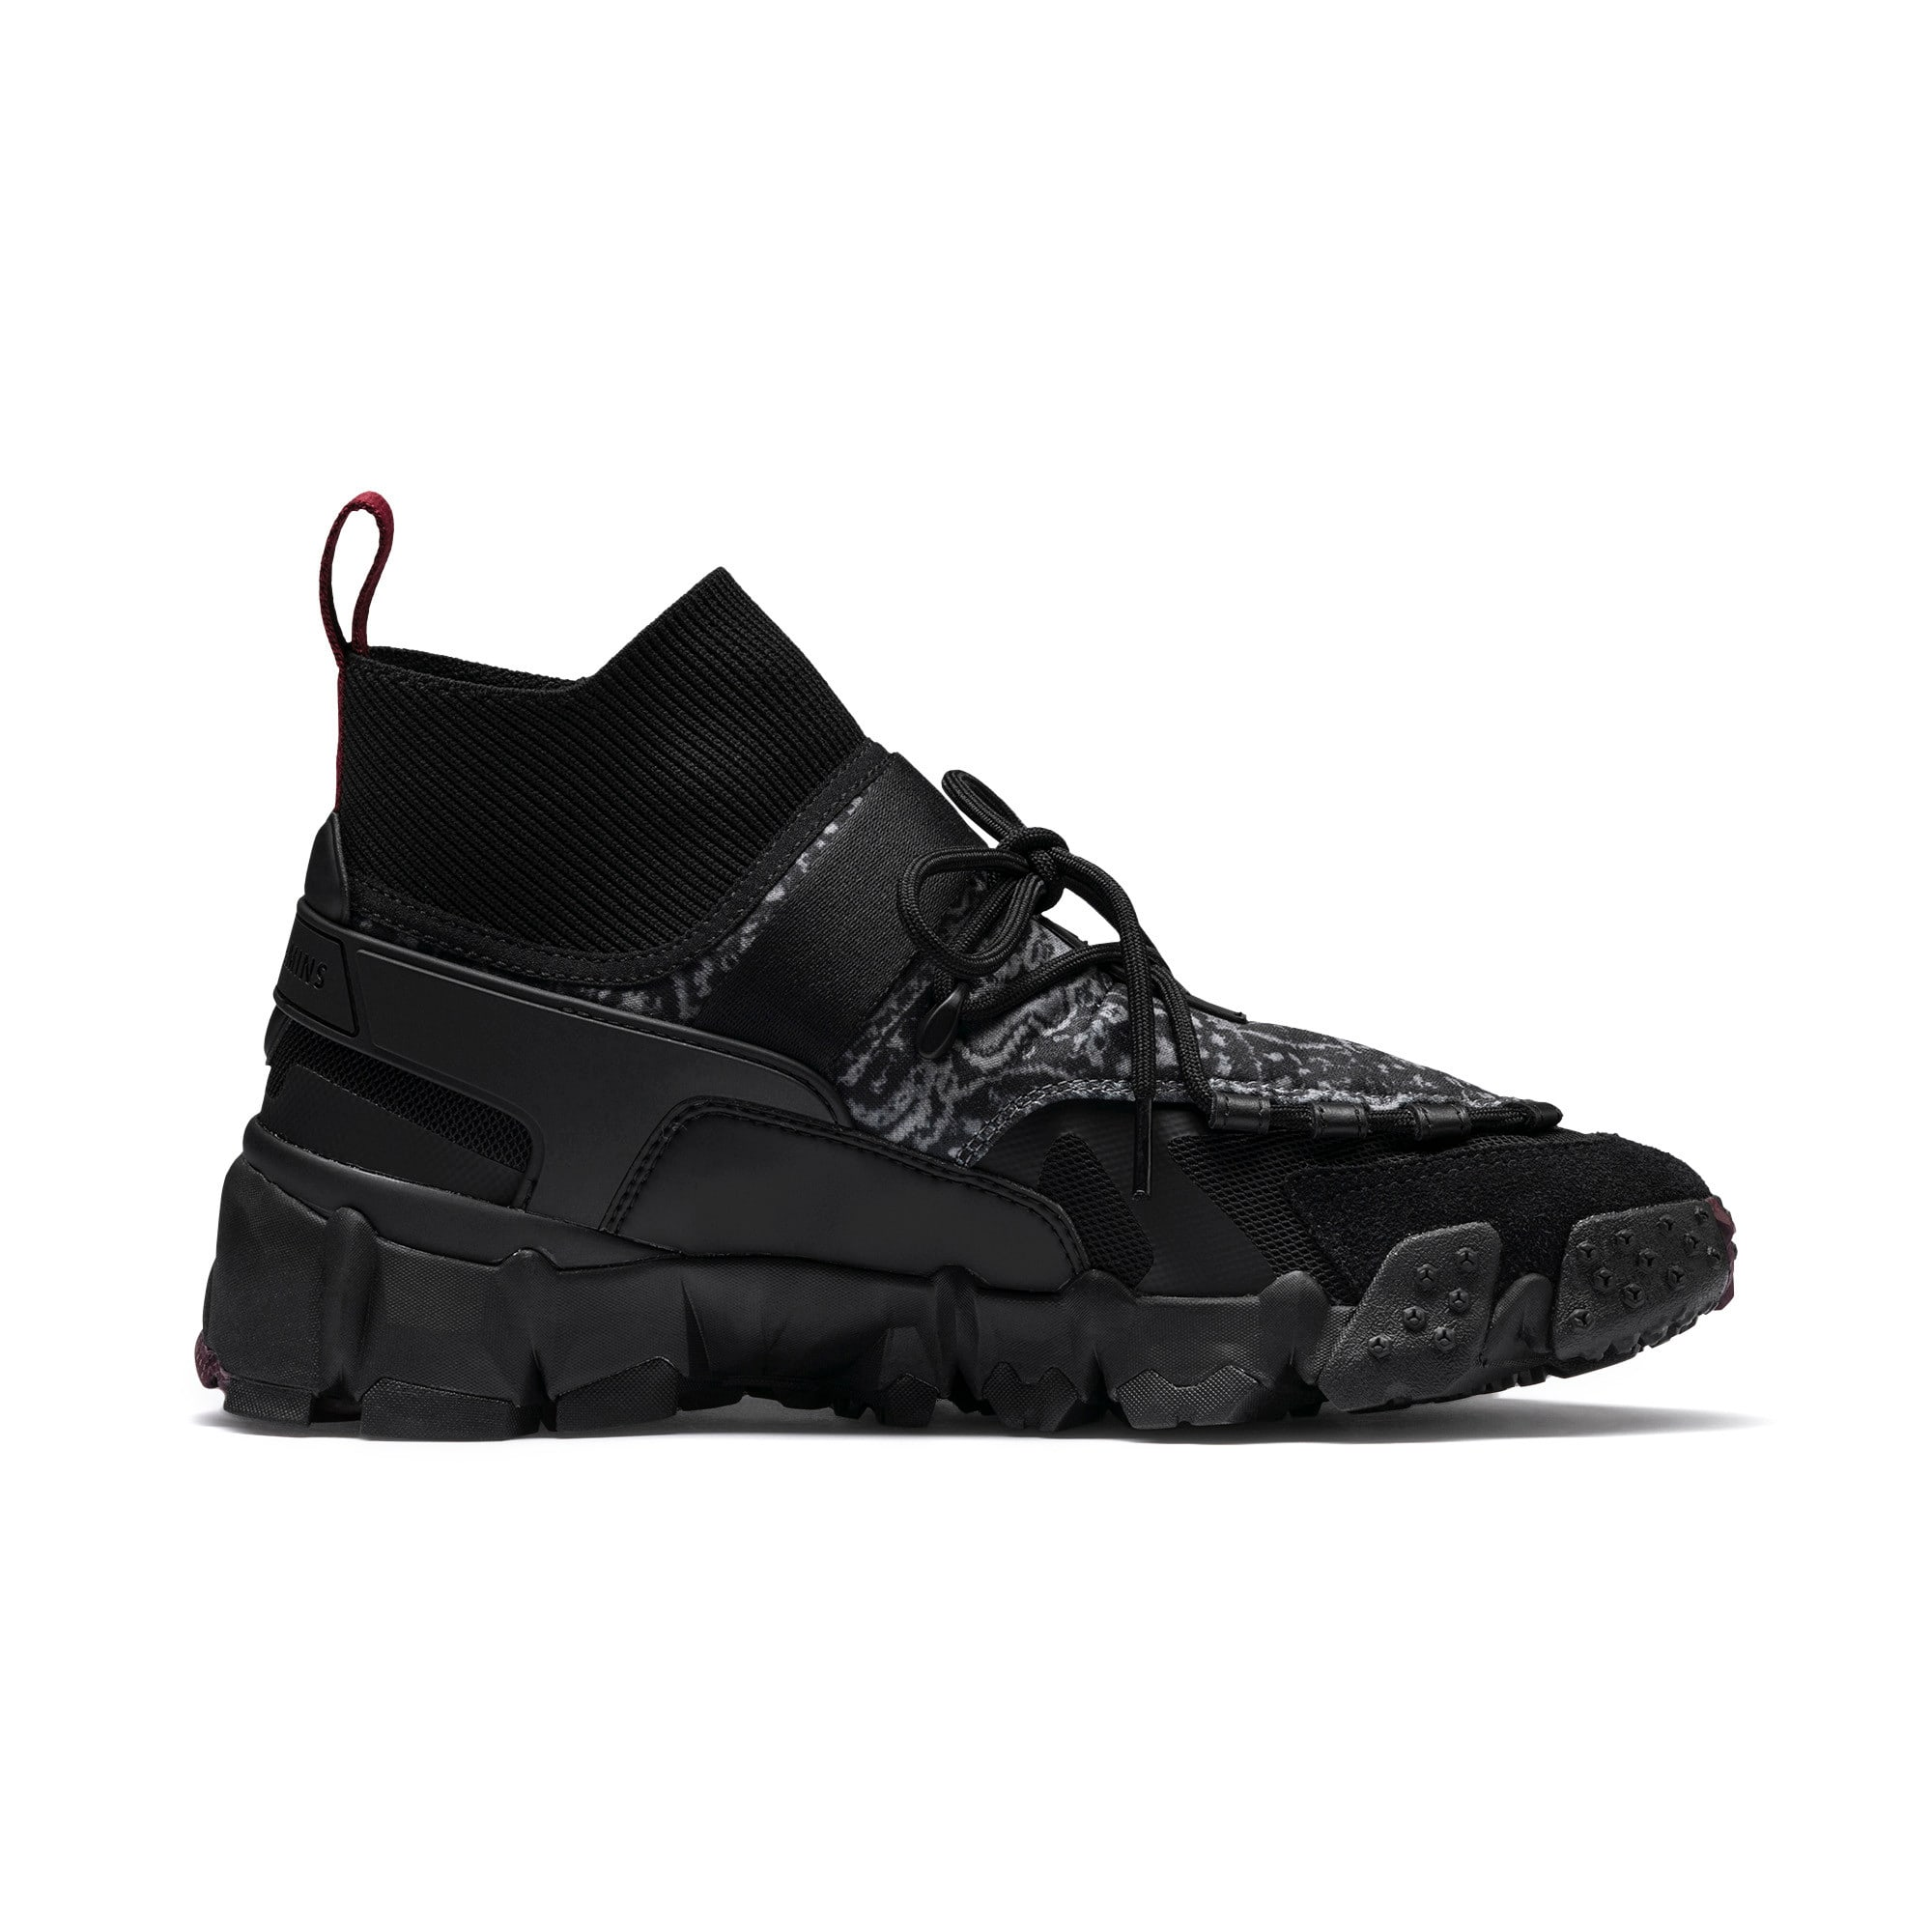 Thumbnail 6 of PUMA x LES BENJAMINS Trailfox Shoes, Puma Black, medium